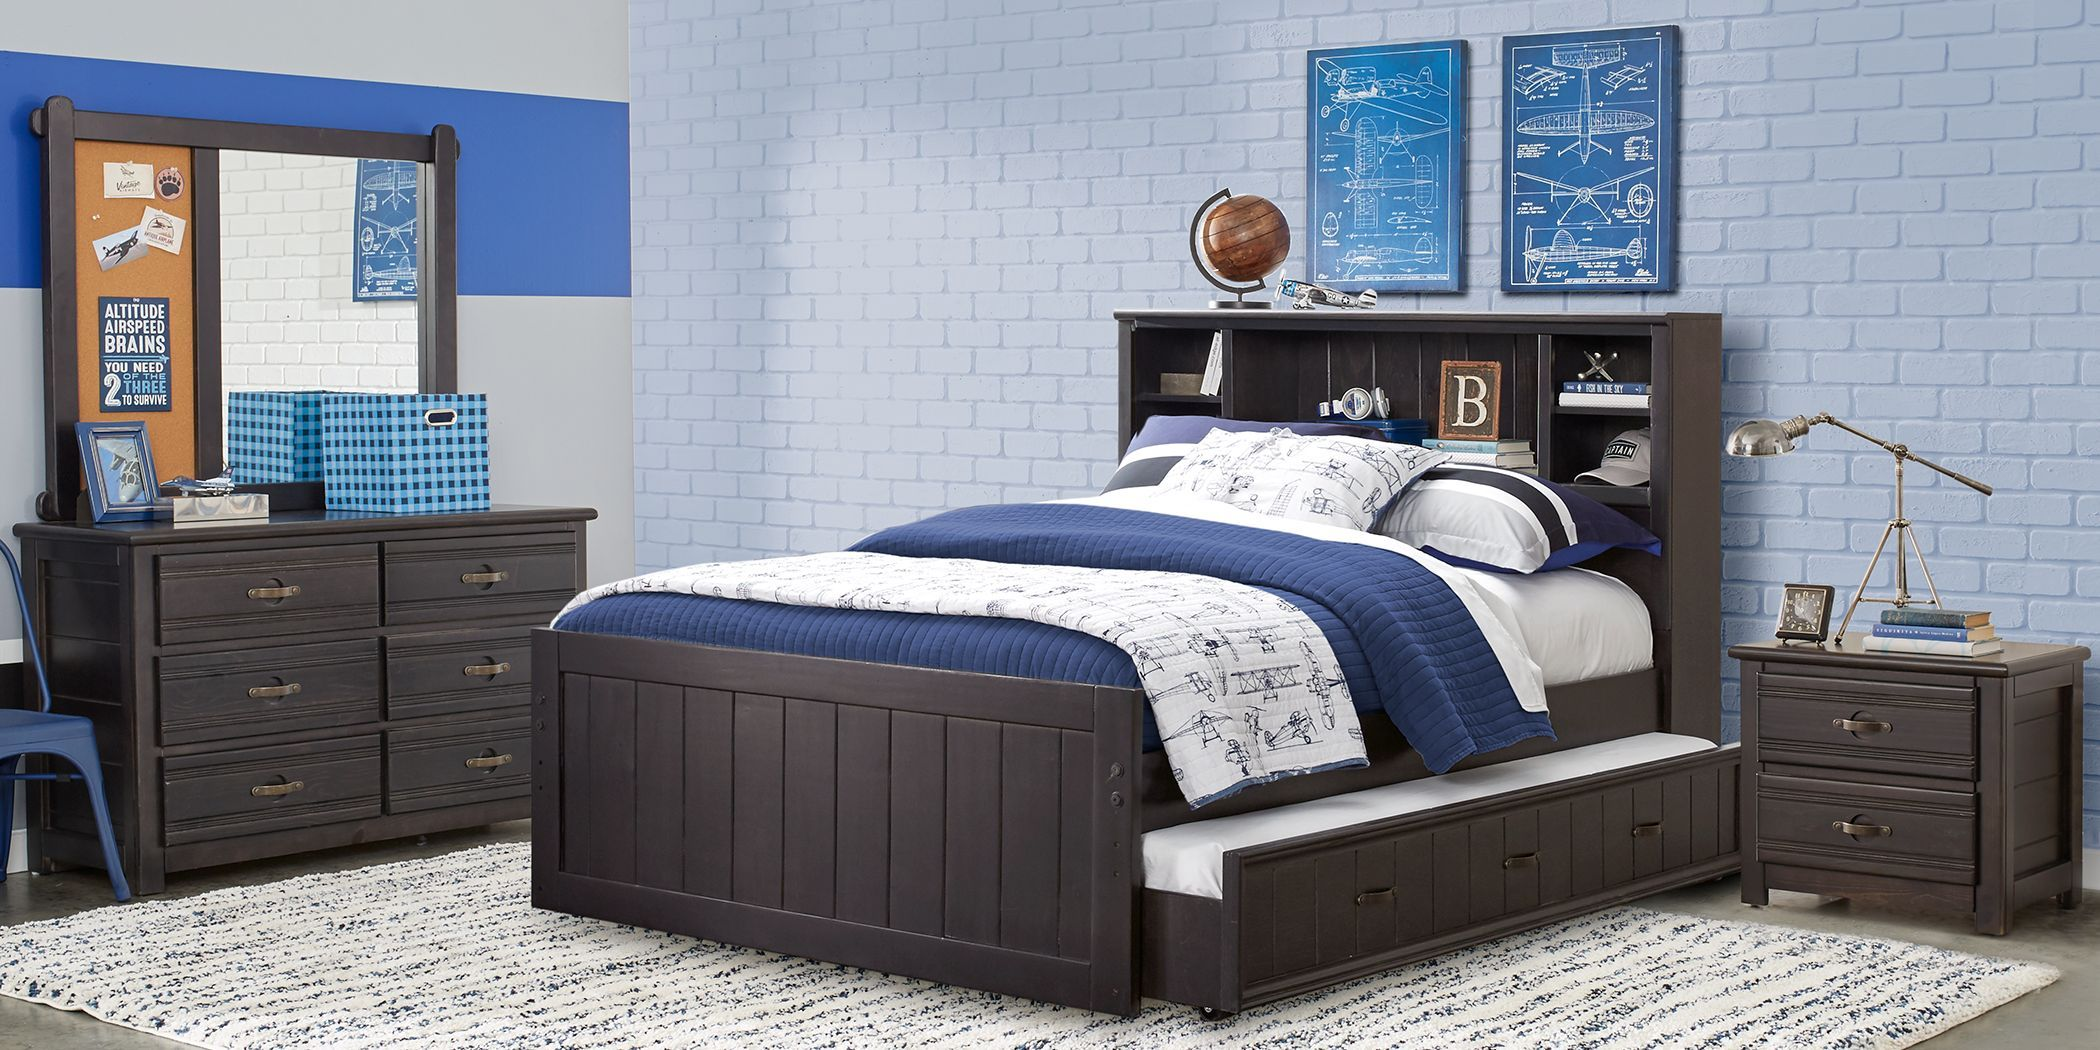 Best Kids Creekside Charcoal 6 Pc Full Bookcase Bedroom Full 400 x 300